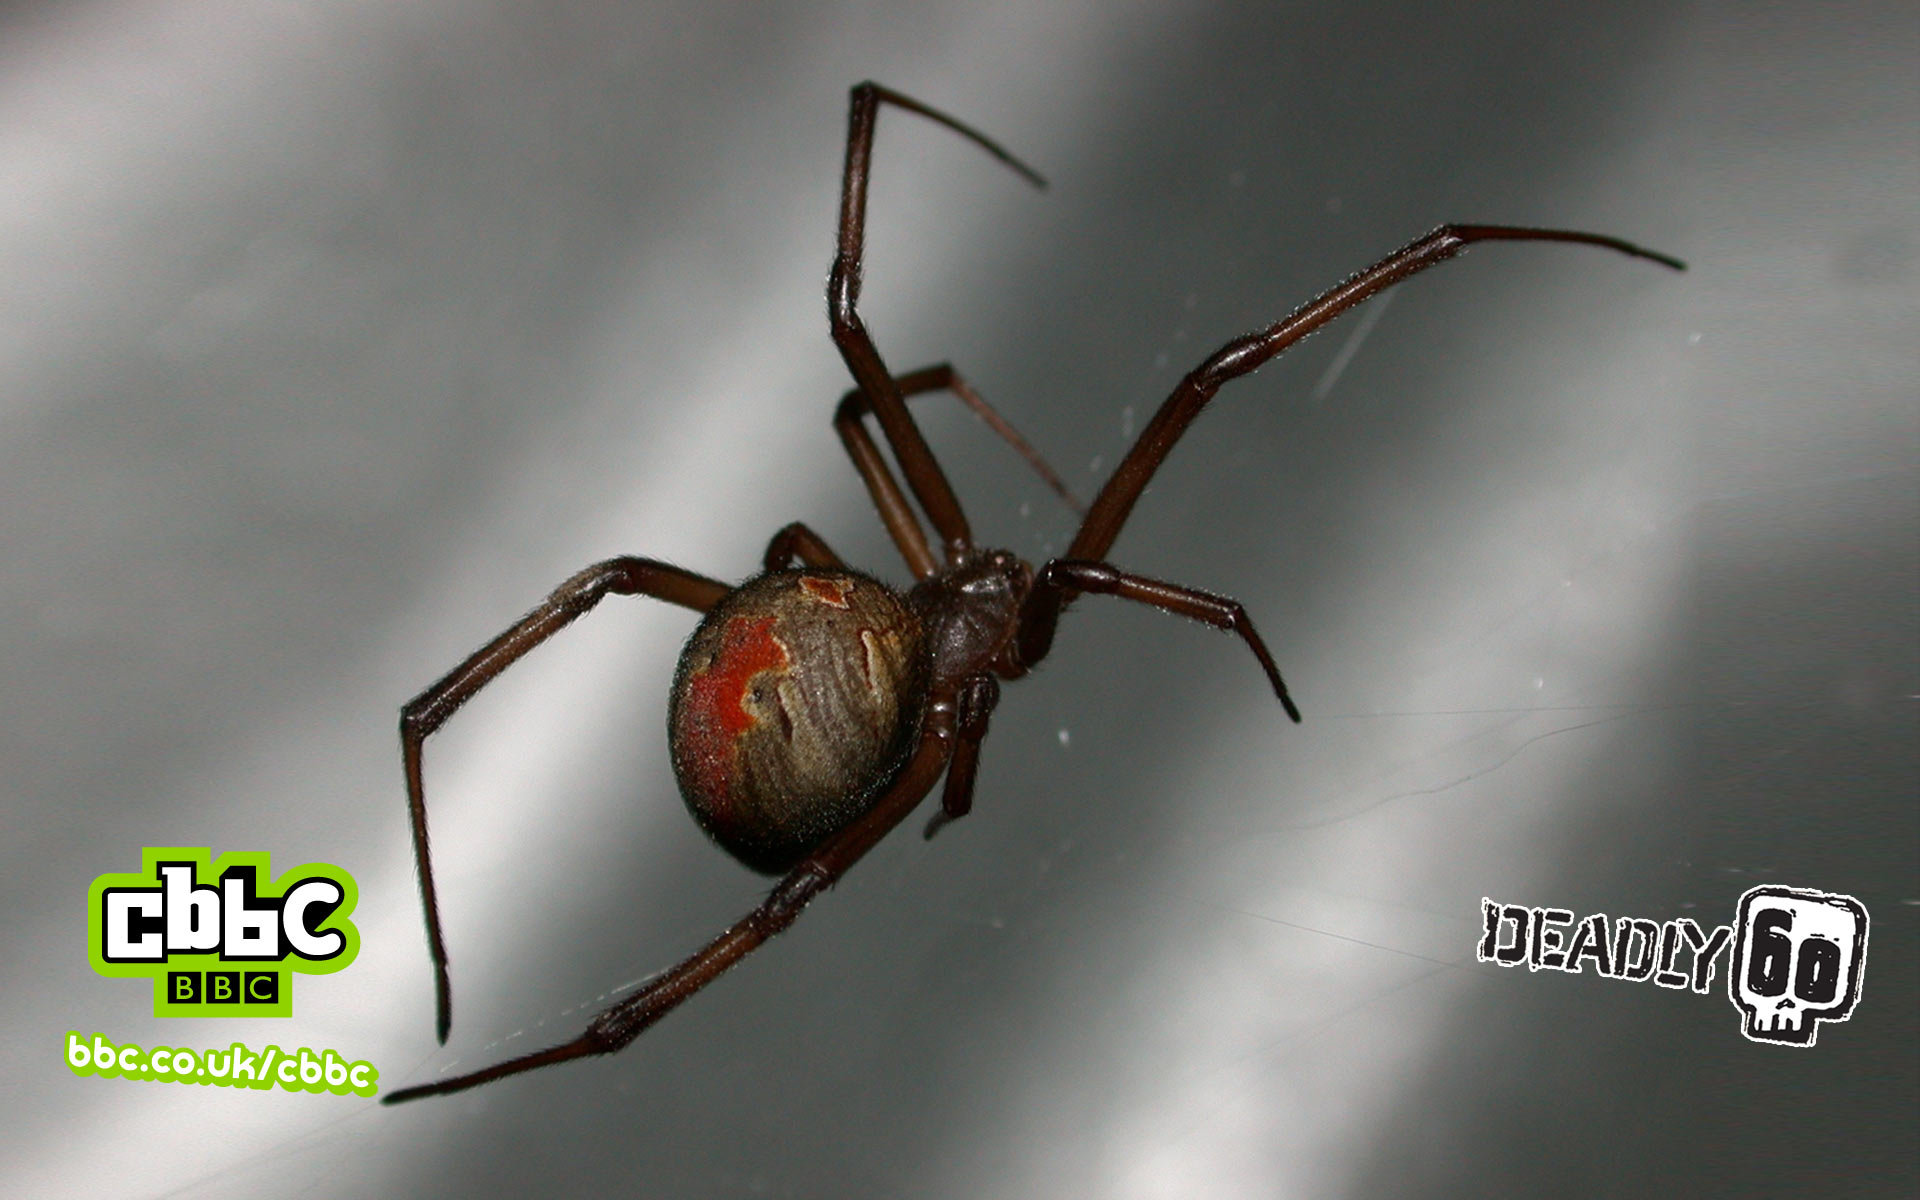 Deadly 60 Redback Spider Wallpaper 1920x1200